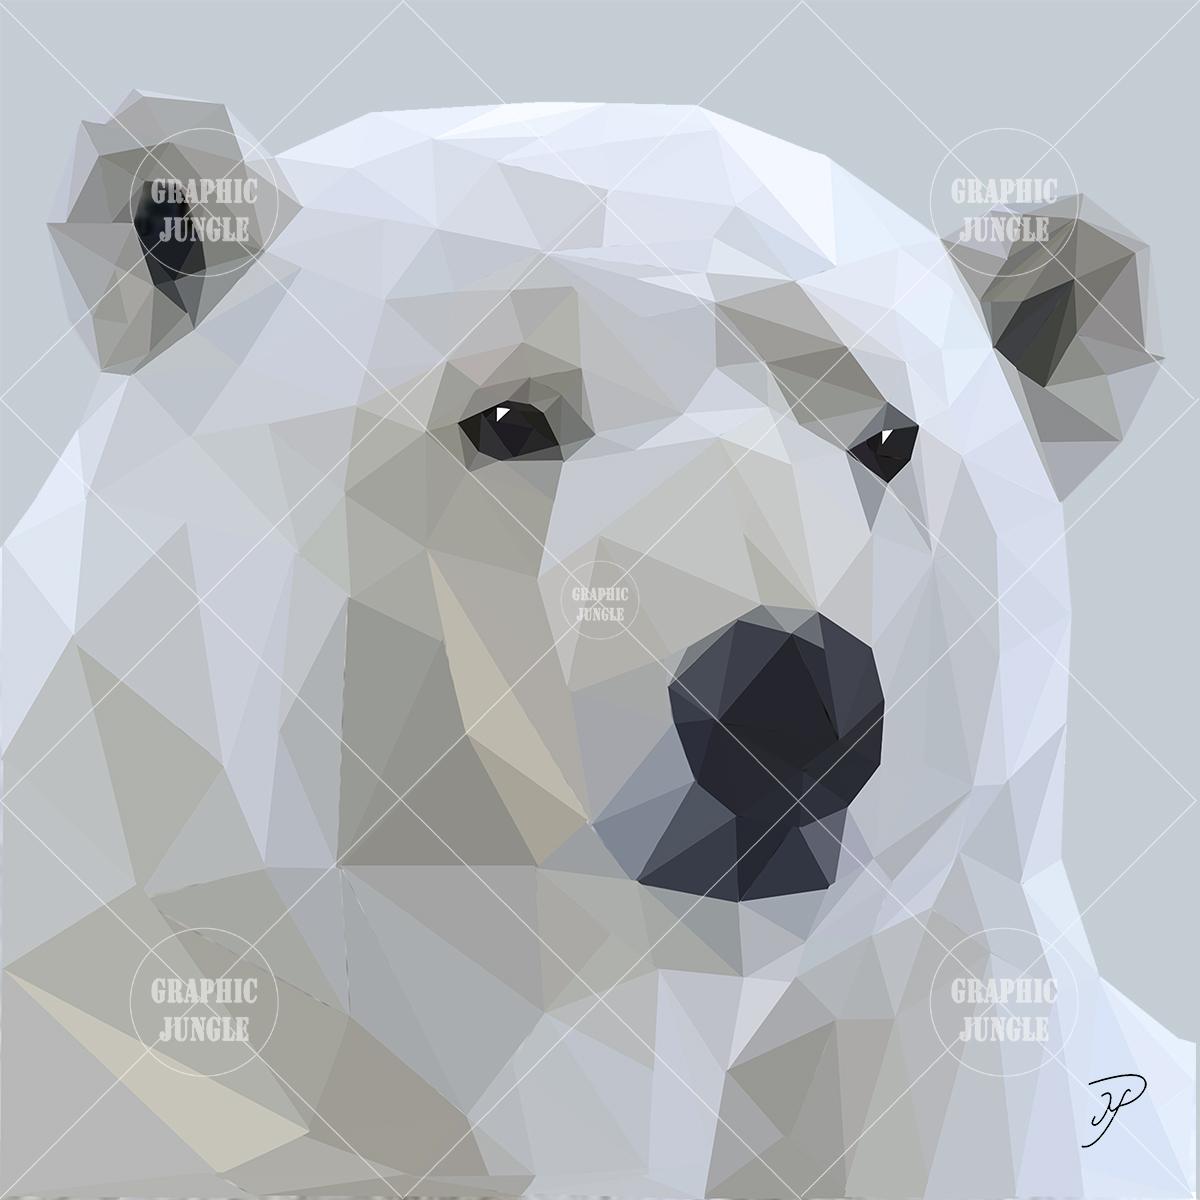 17 POLAR BEAR